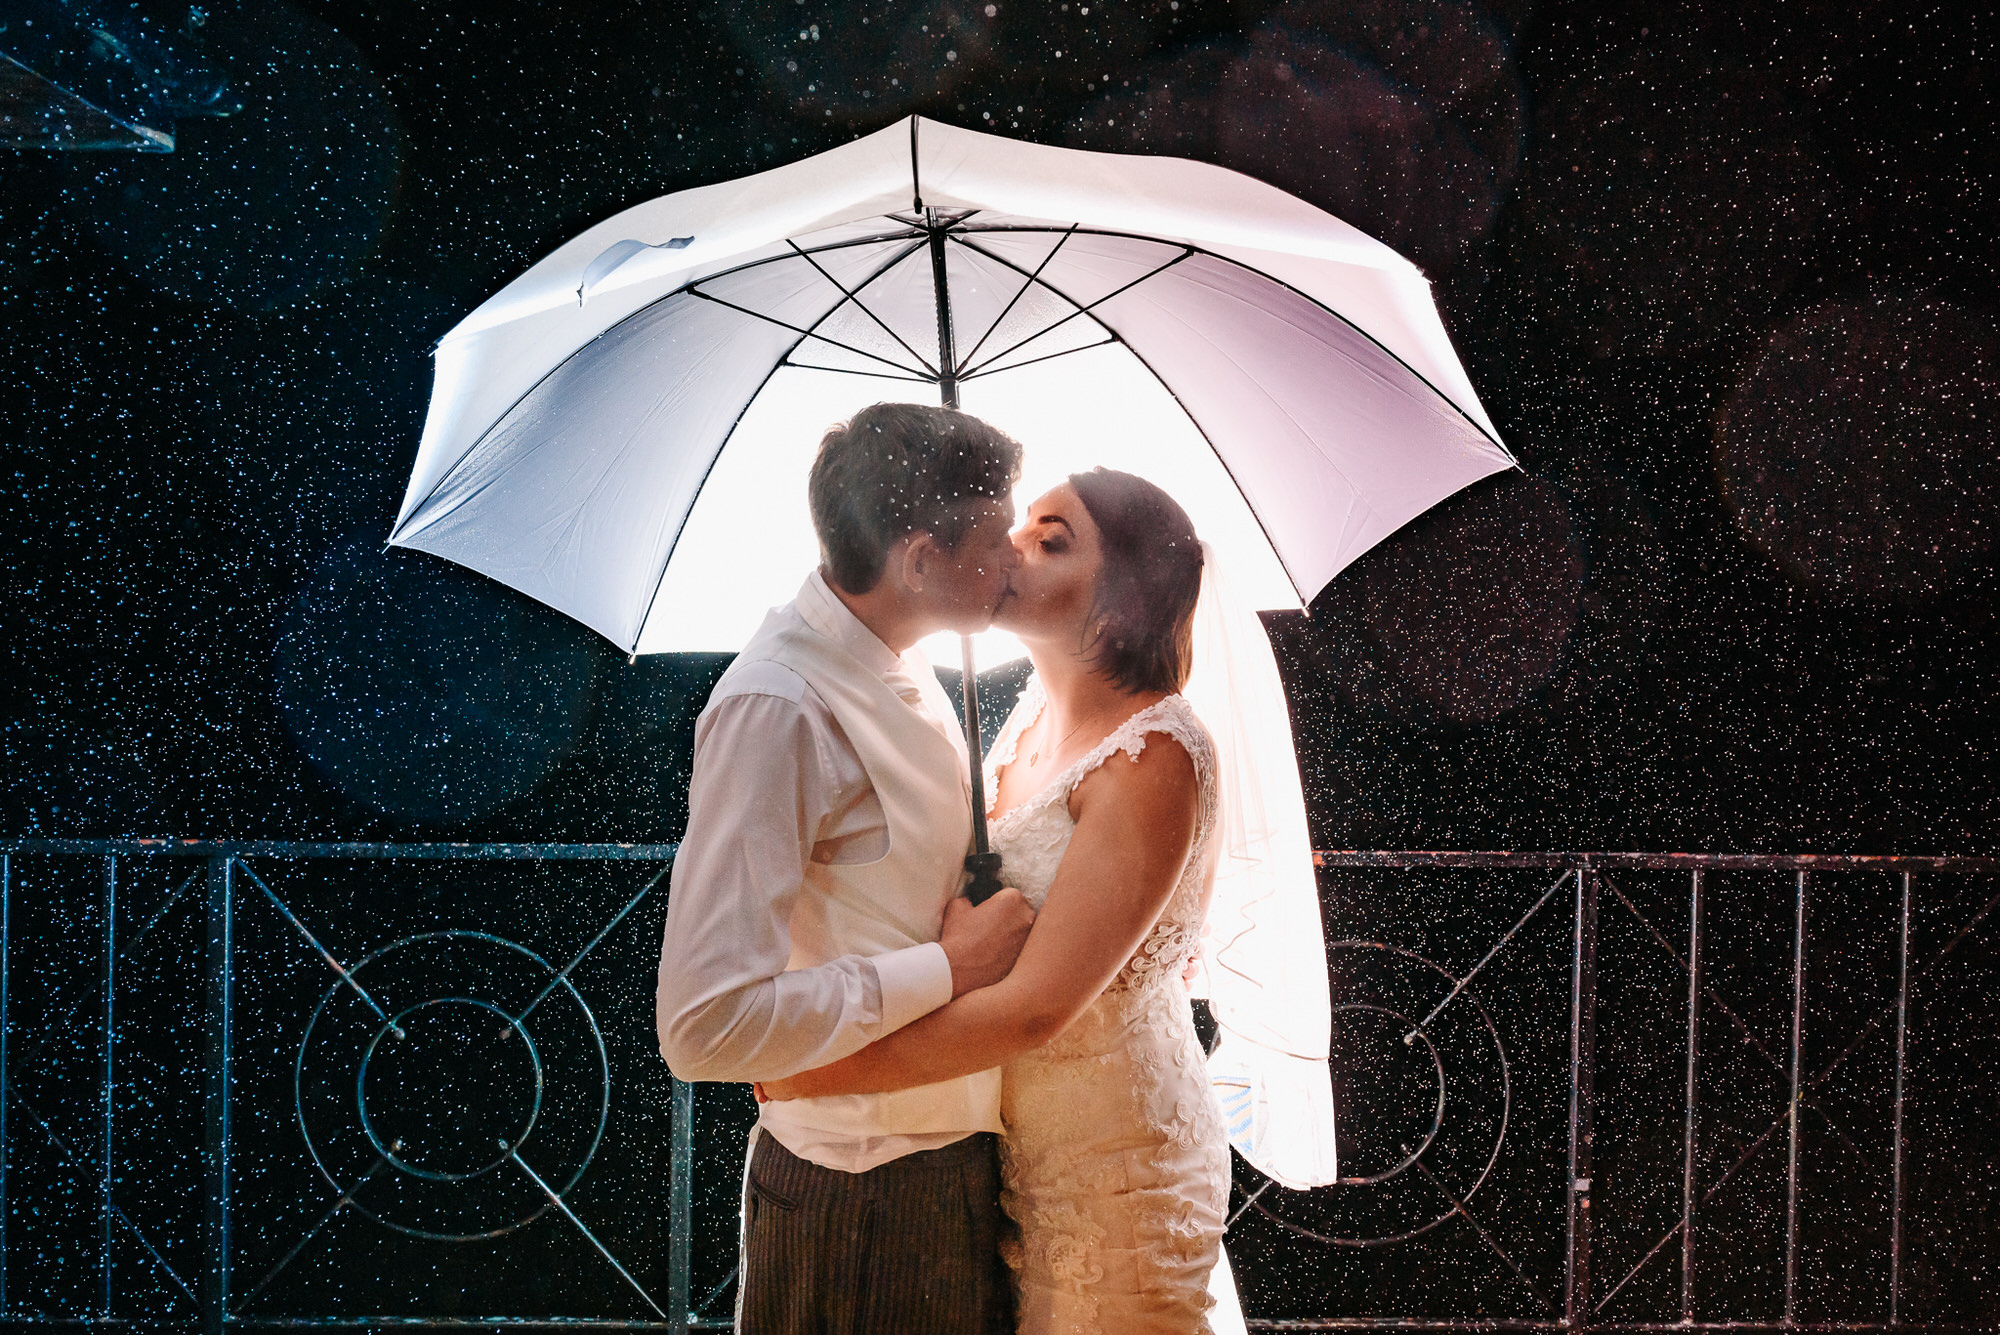 Best Of Yorkshire Wedding Photography 2017 - Martyn Hand-14.jpg